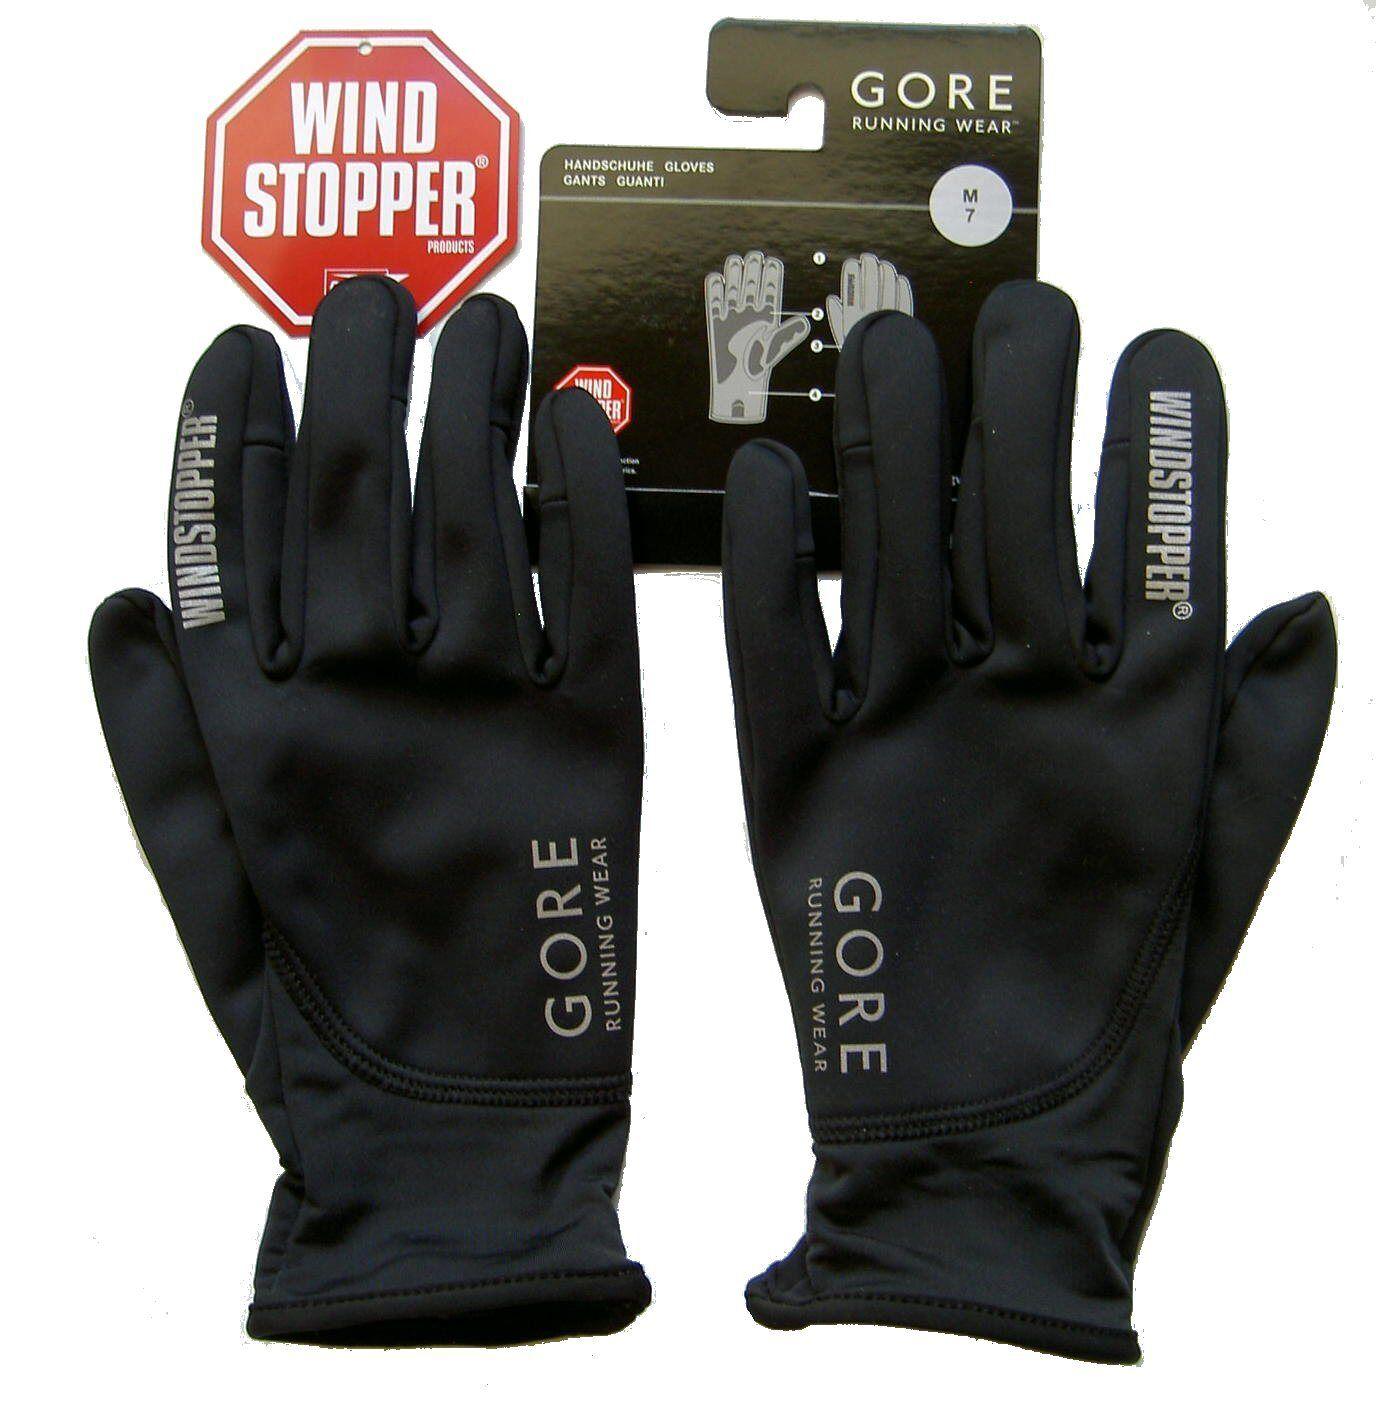 Gore Essential così Vento Stopper In Gloves esecuzione Gloves In Tg. 9/xl Corsa Guanti 9753e6